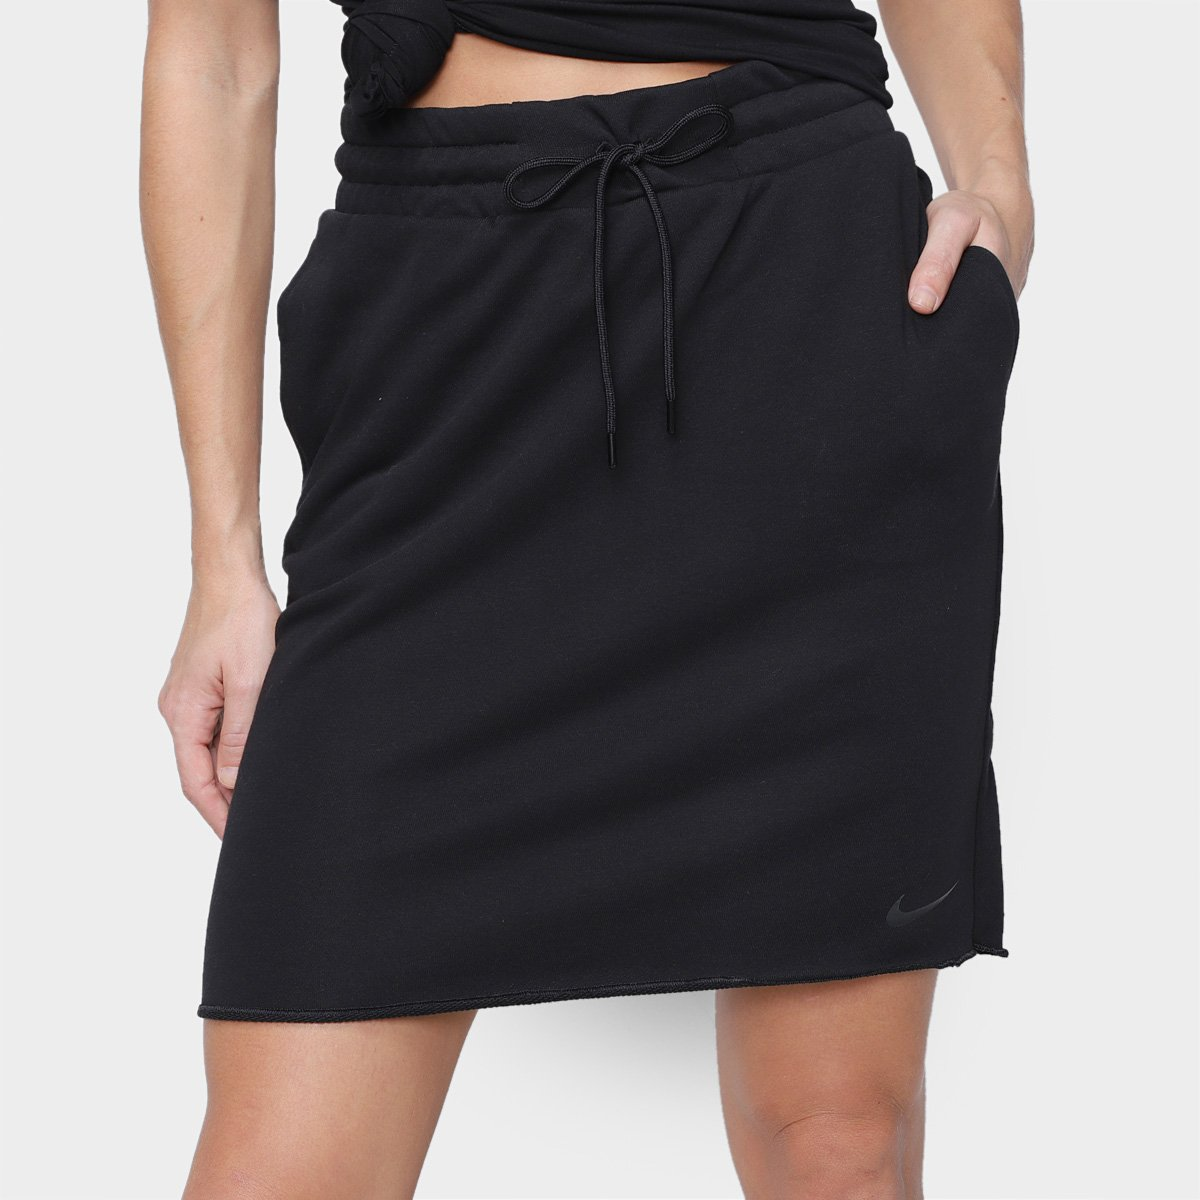 Saia Nike Icn Clash Skirt Ft Feminino